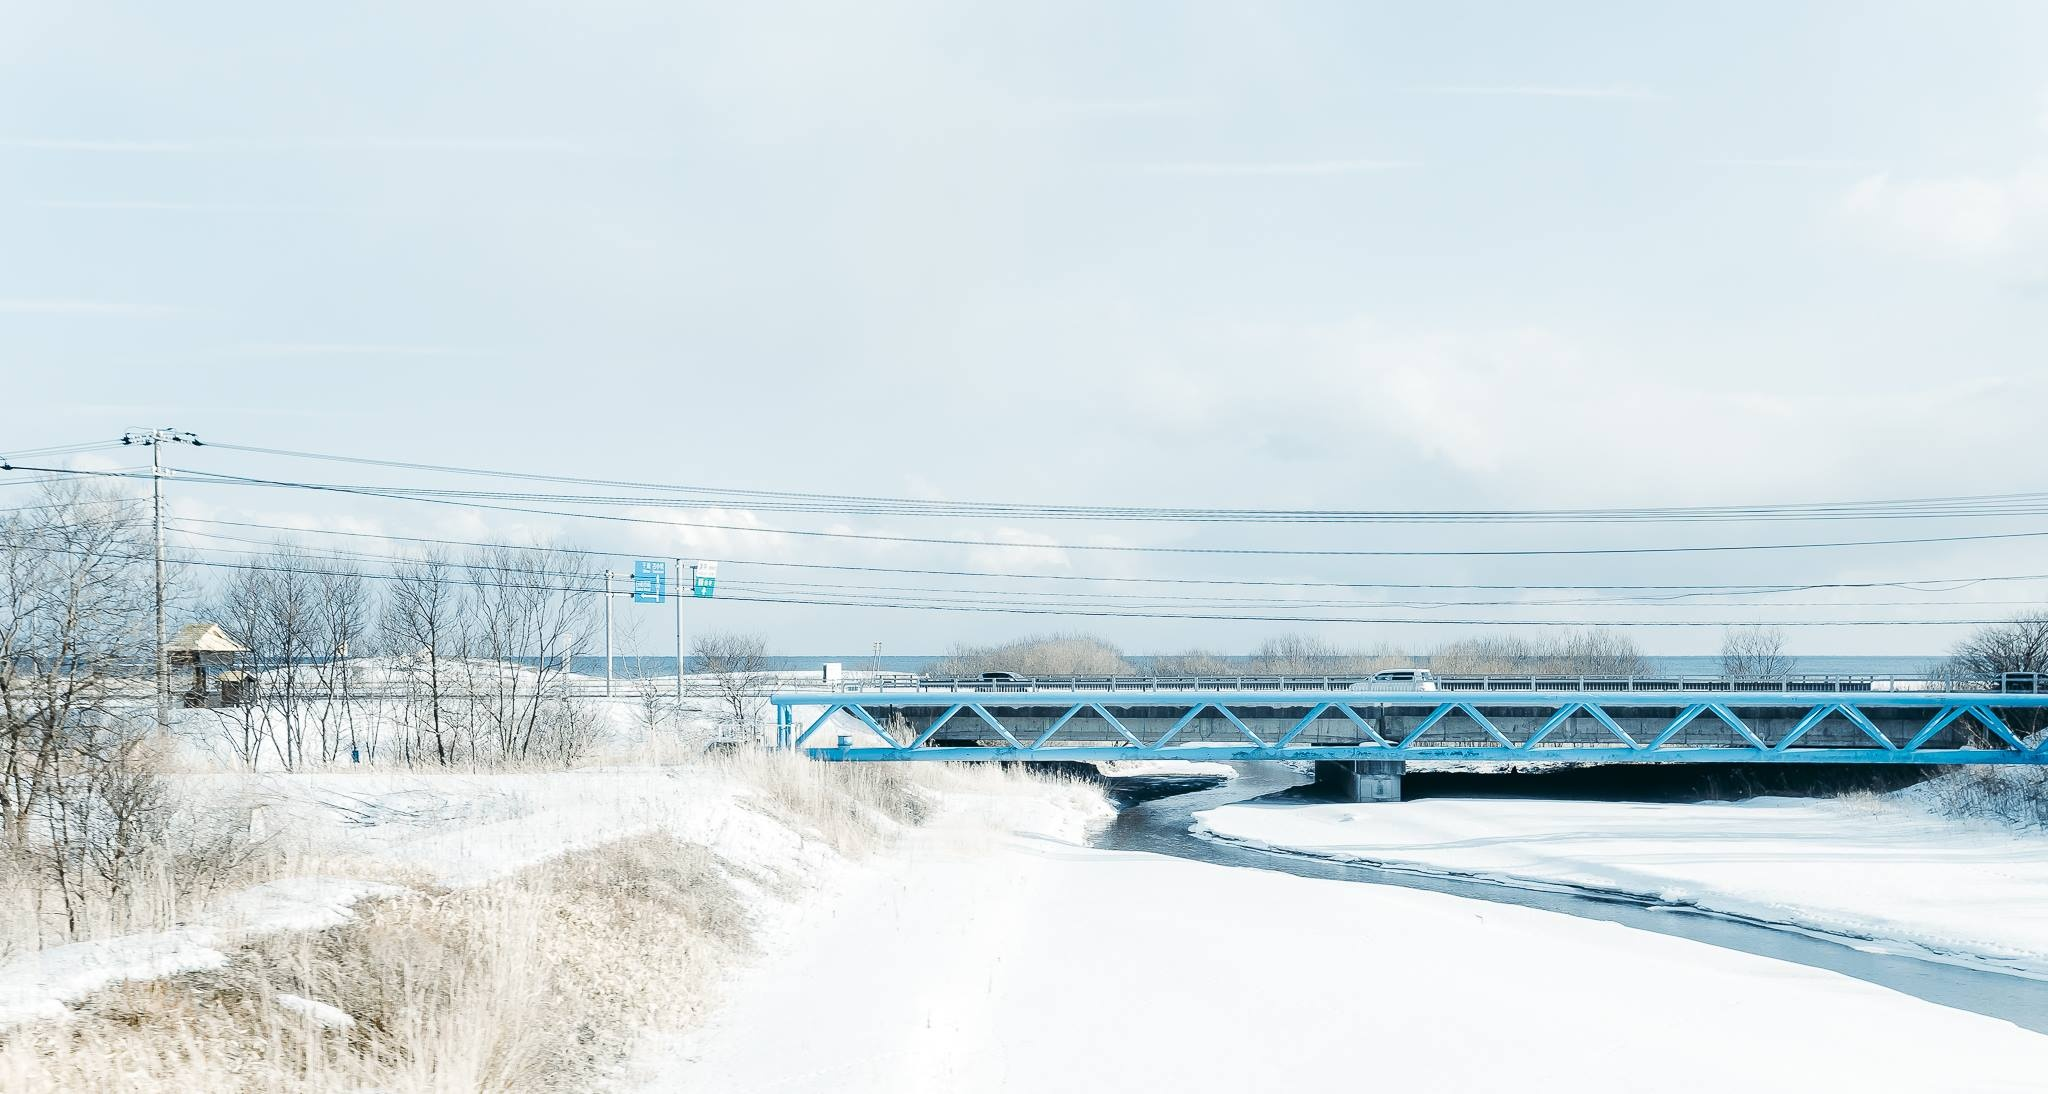 Hokkaido tuyet trang, noi dang den nhat mua dong o Nhat Ban hinh anh 9